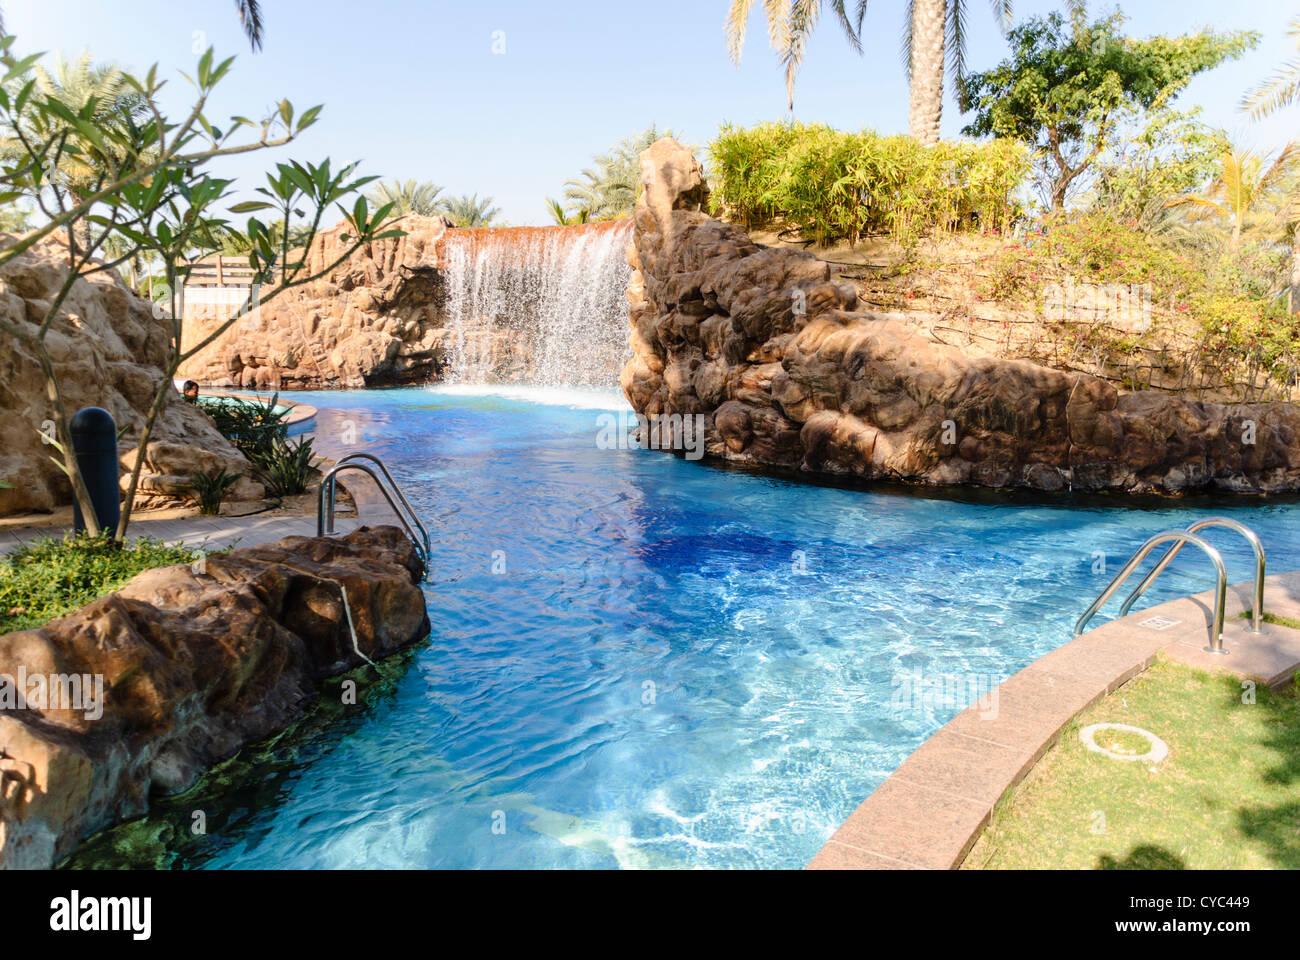 Wasserfall In Den Pool Des Hotel Emirates Palace, Abu Dhabi